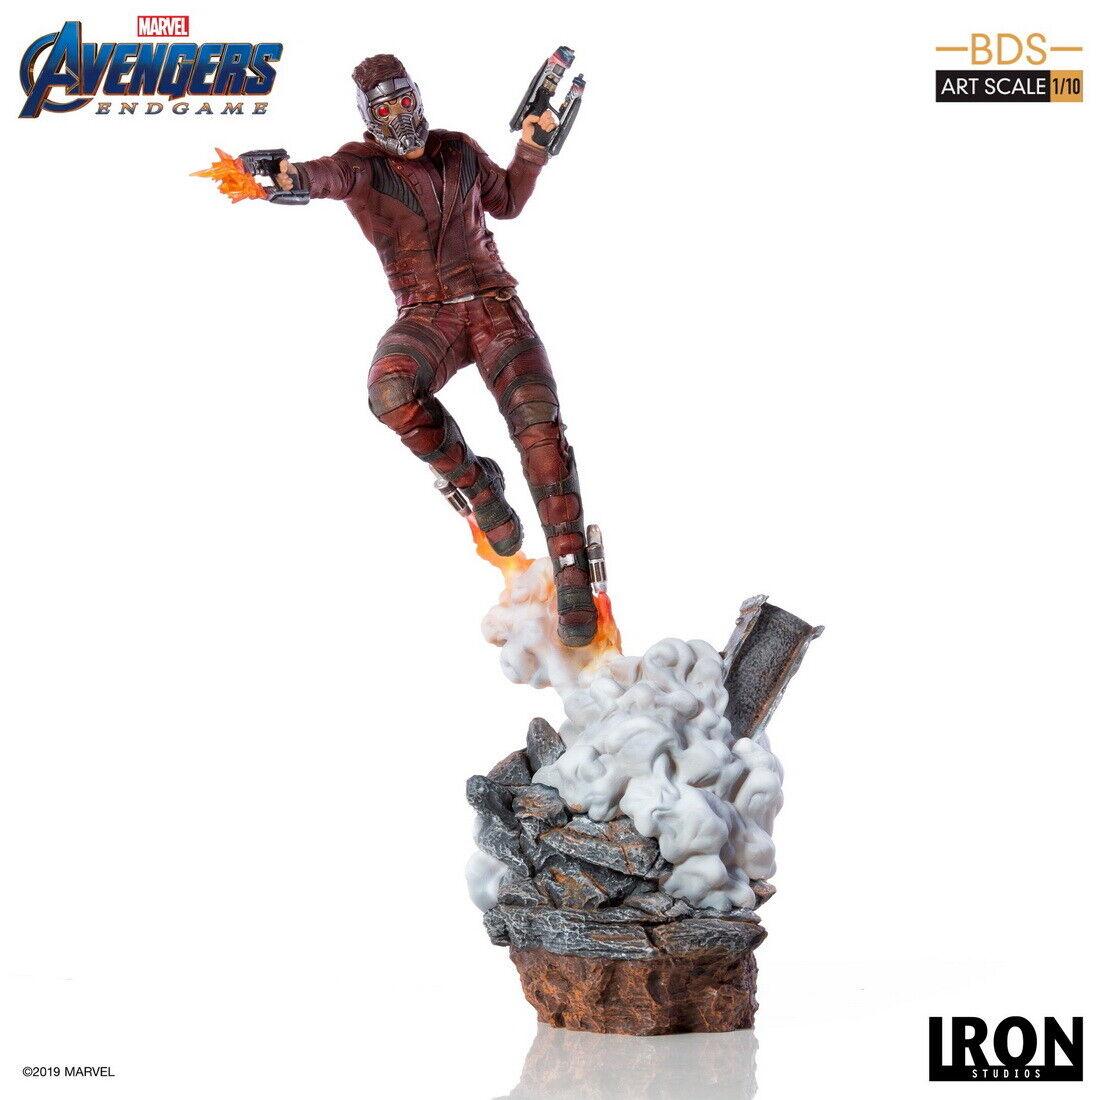 Iron Studios Avengers: Endgame Star-Lord BDS Art 1/10 Statue on eBay thumbnail